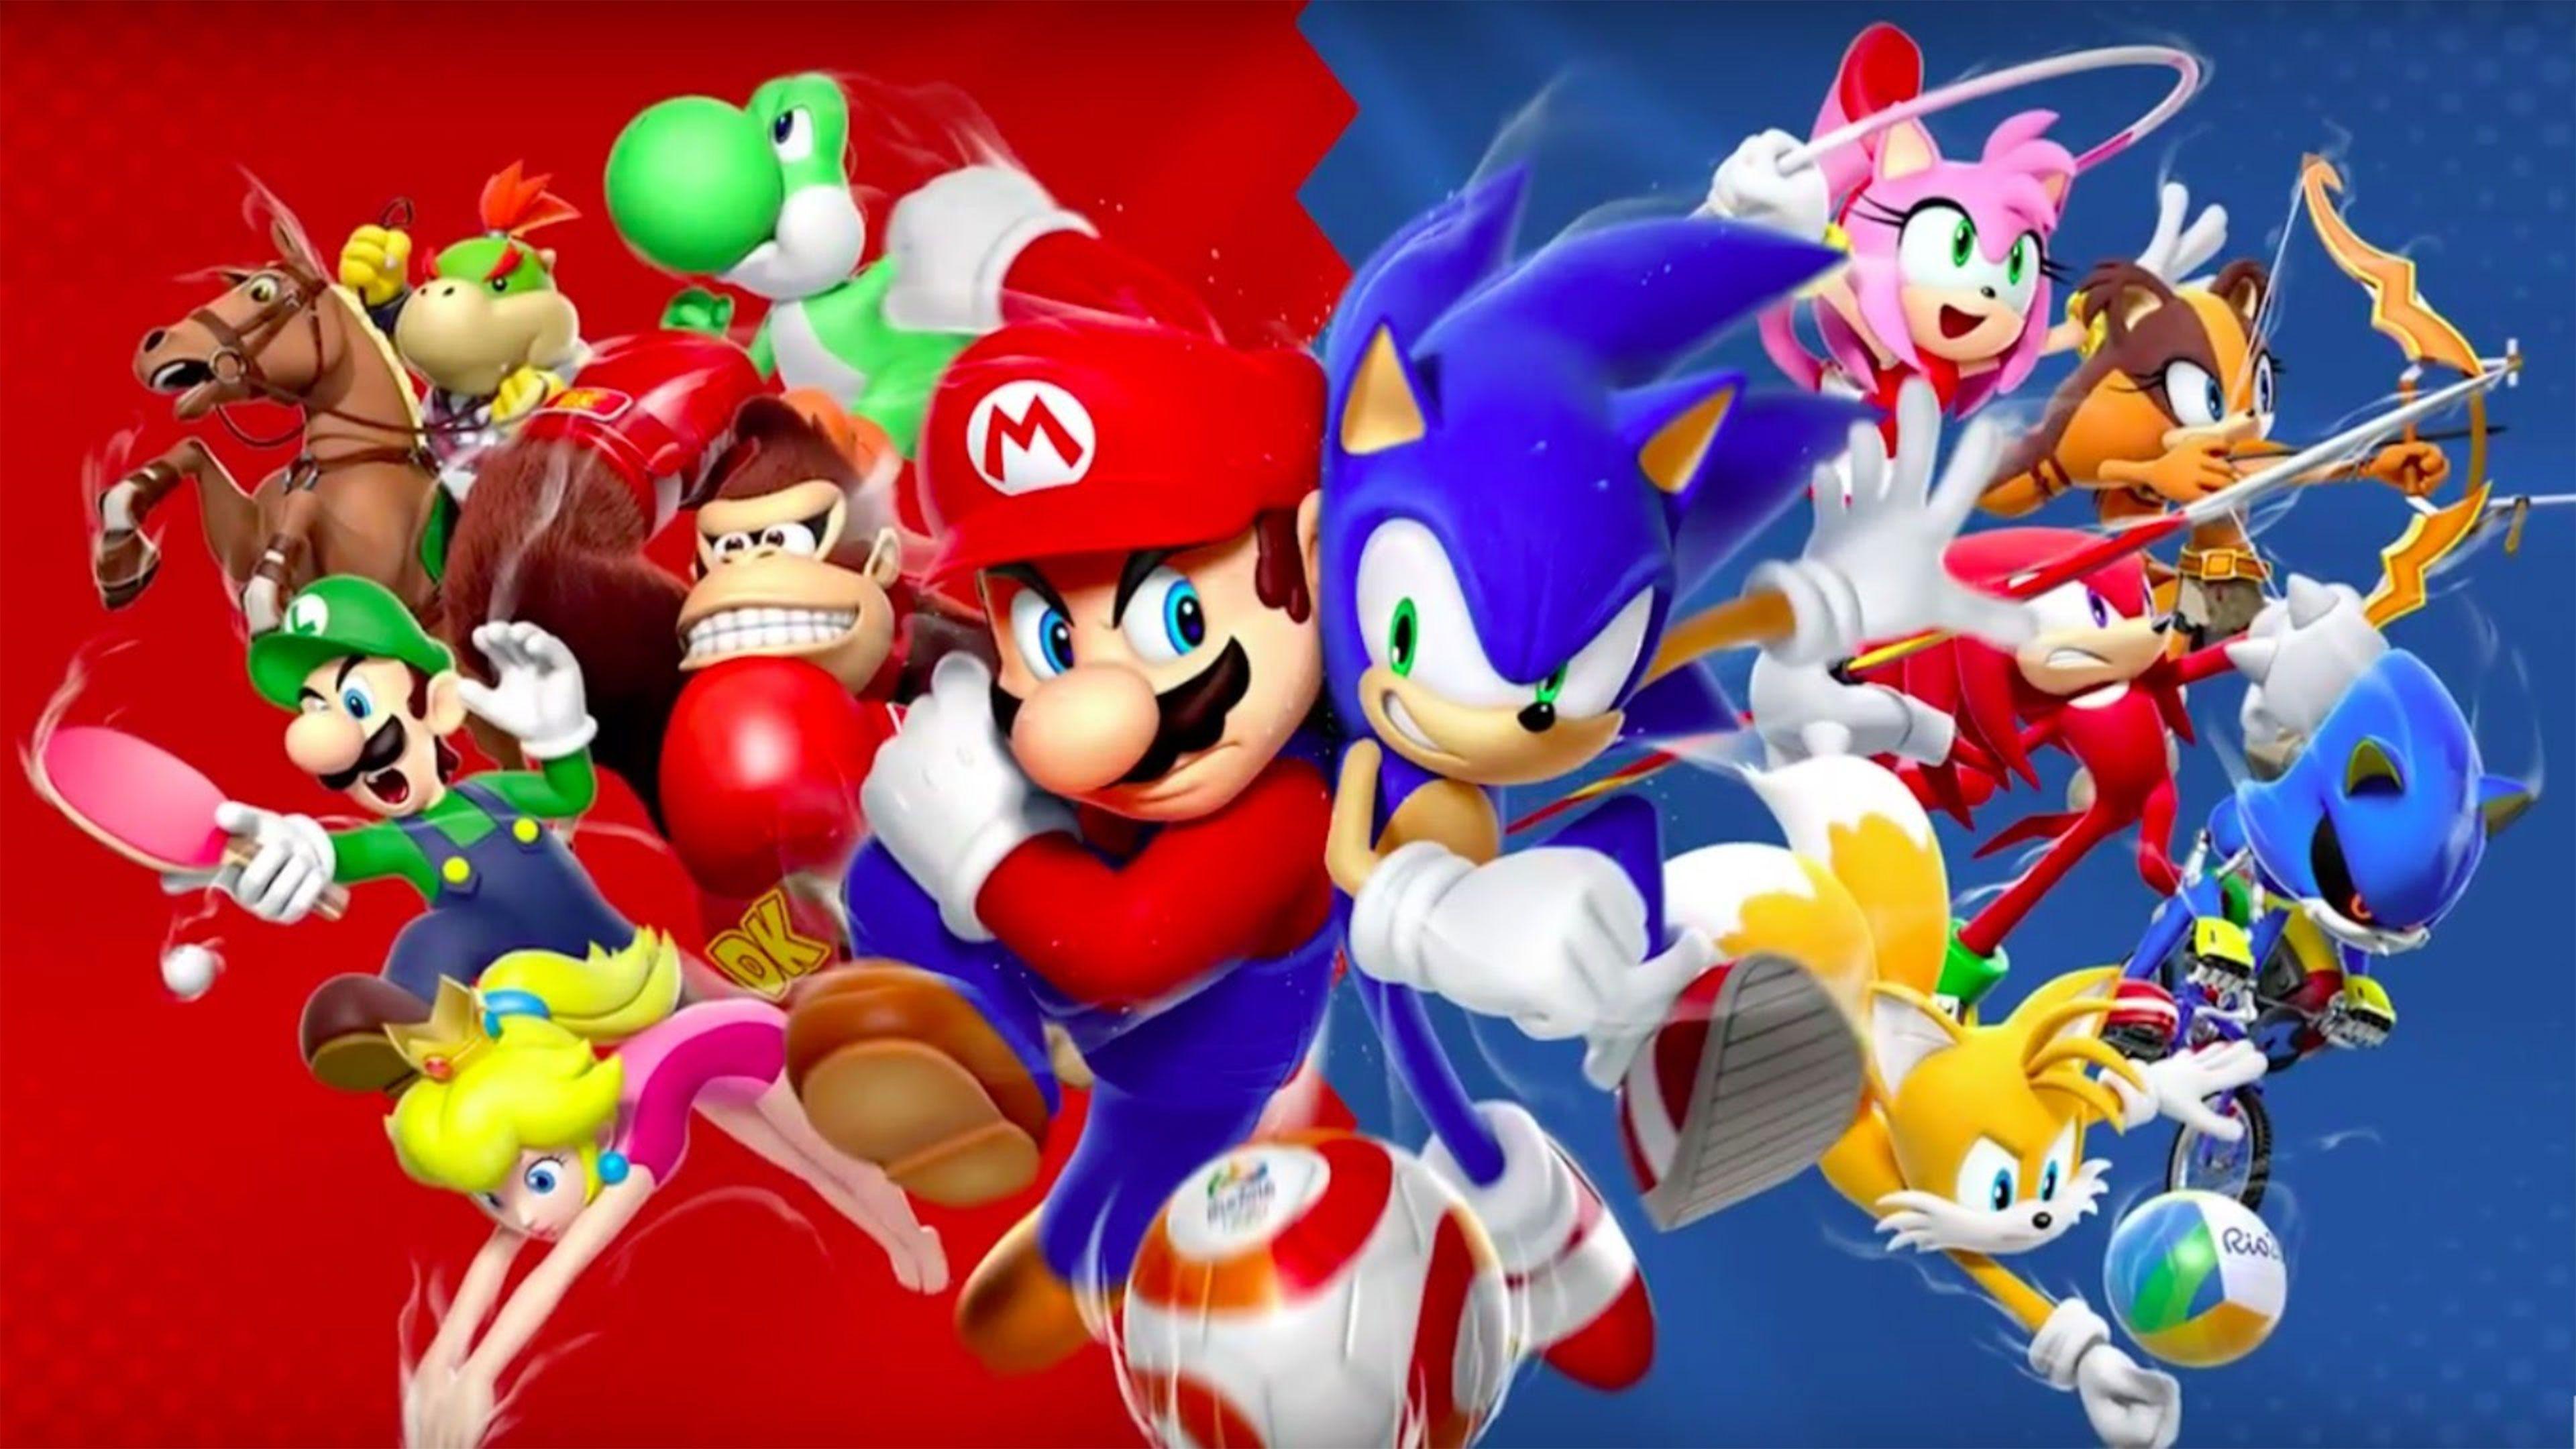 Mario Wallpaper Cartoons Anime Animated 97 Wallpapers 3d Wallpapers Sonic Mario Sonic Birthday